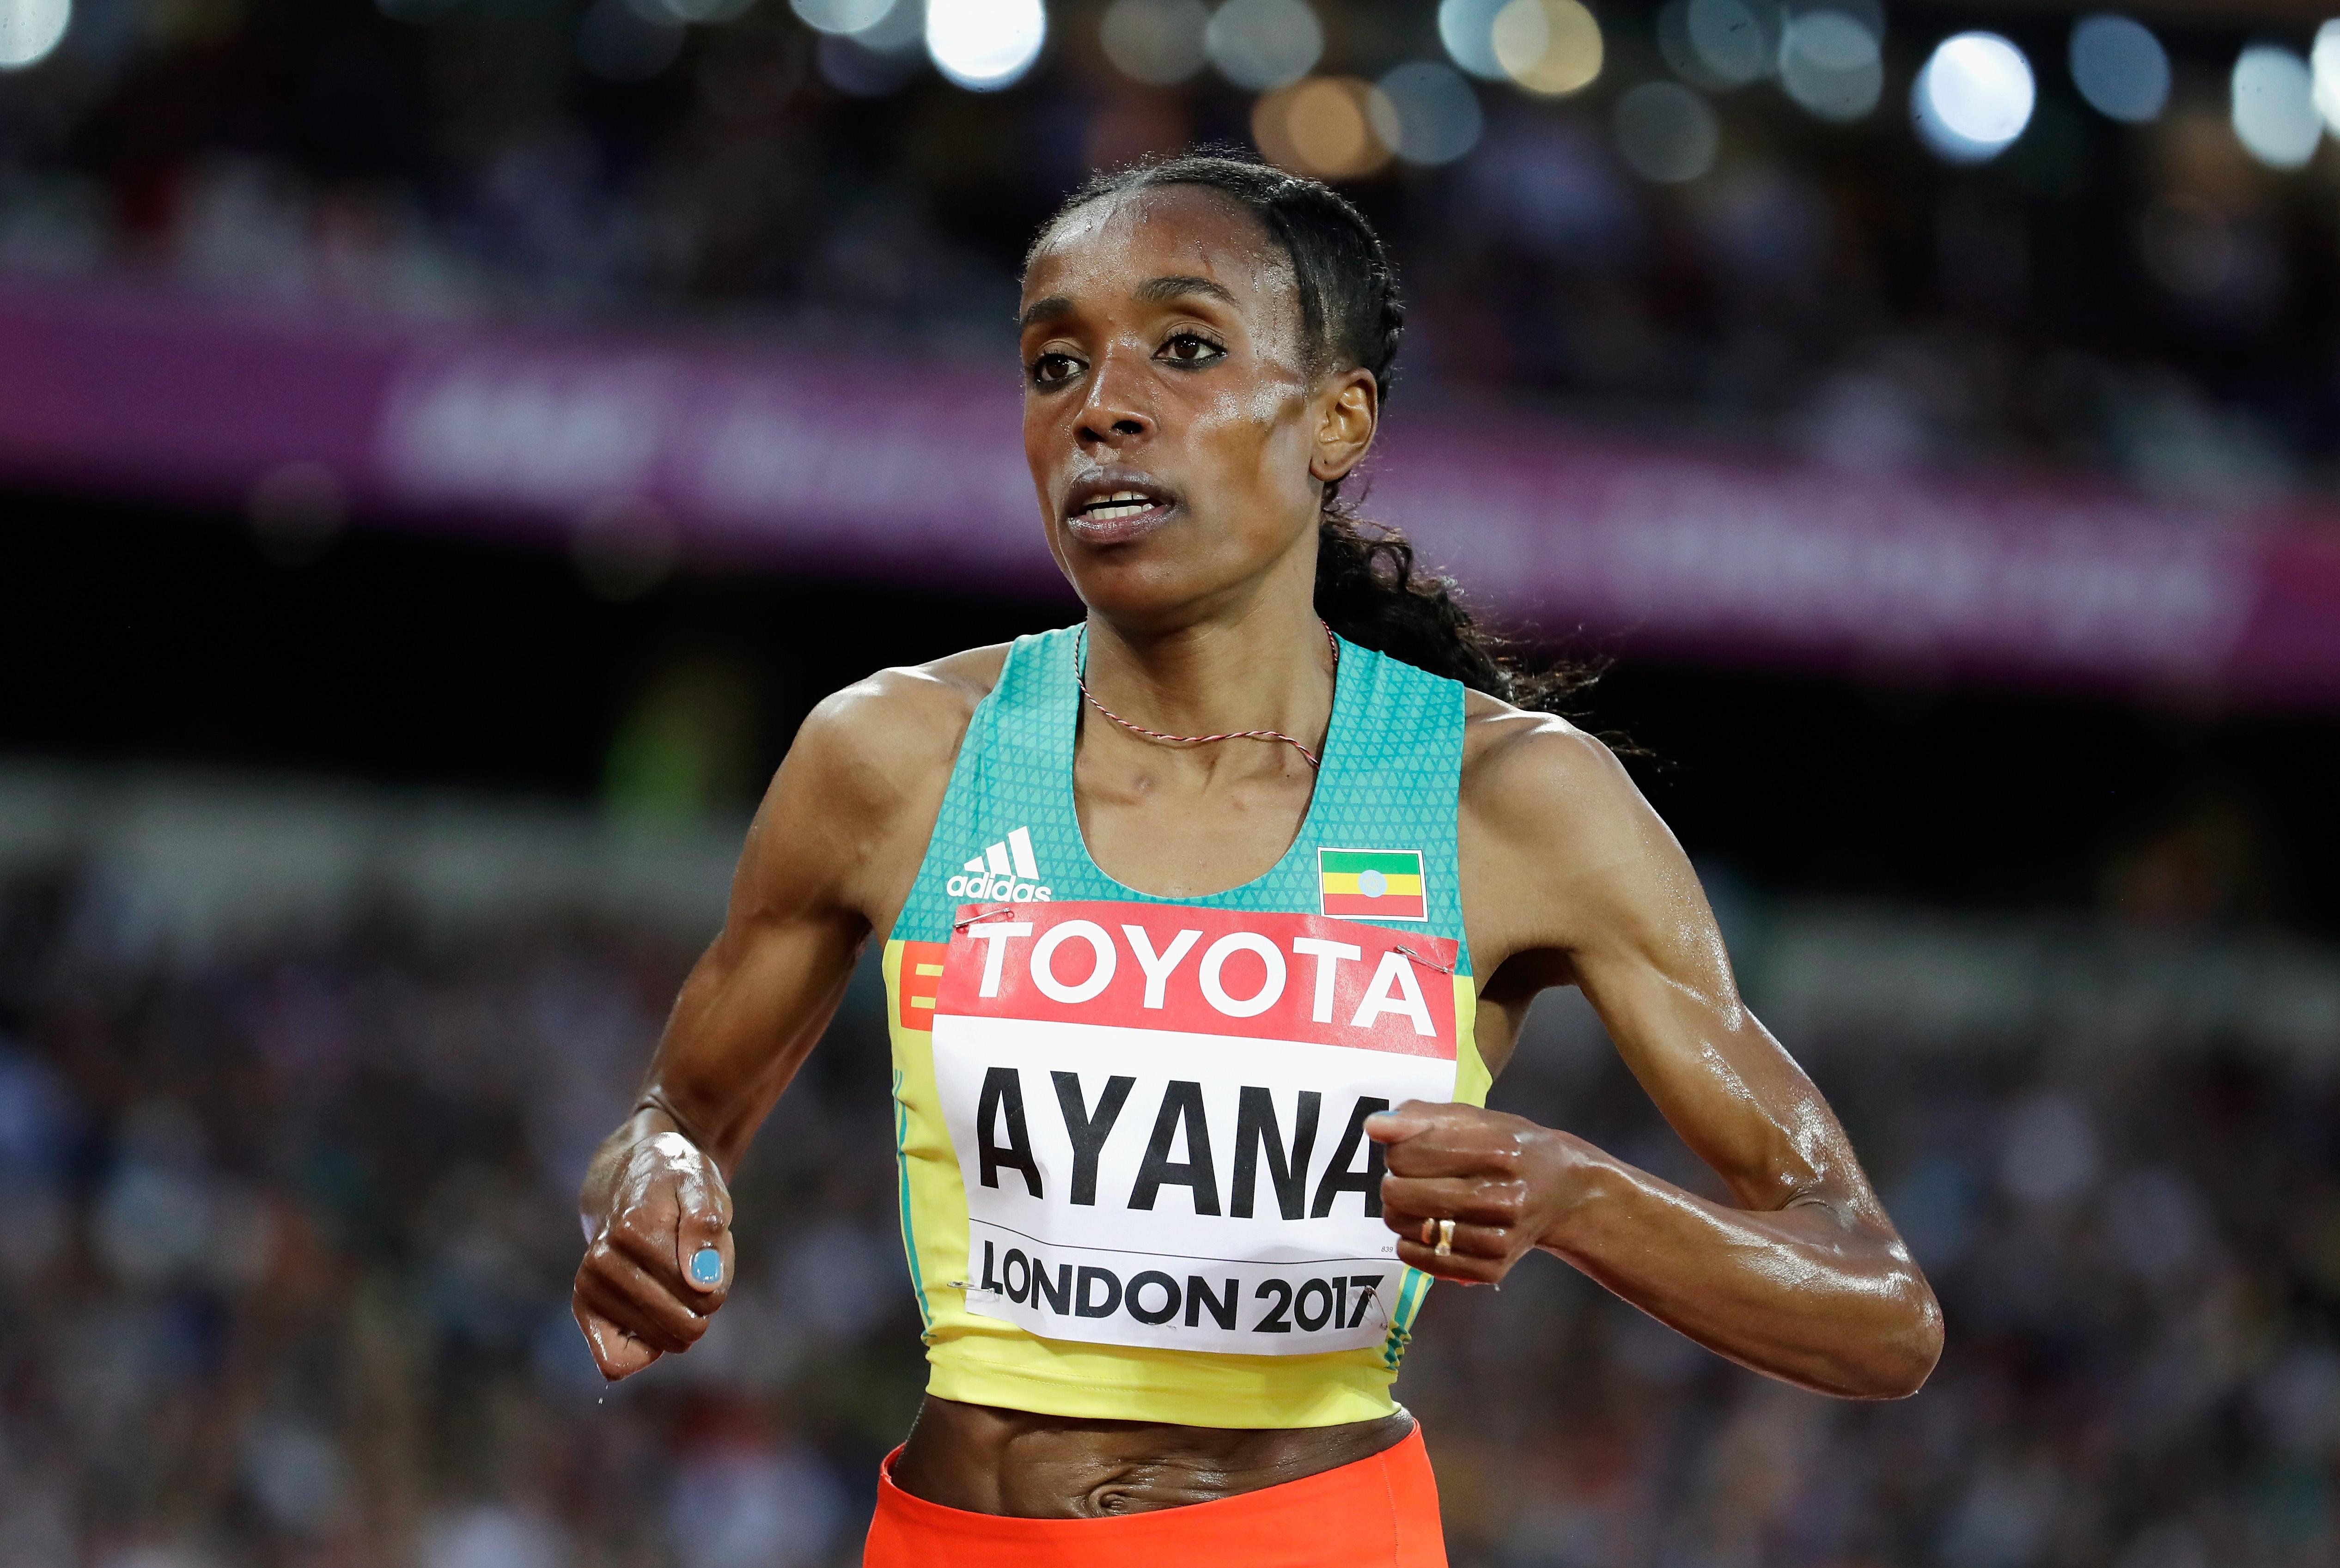 16th IAAF World Athletics Championships London 2017 - Day Two